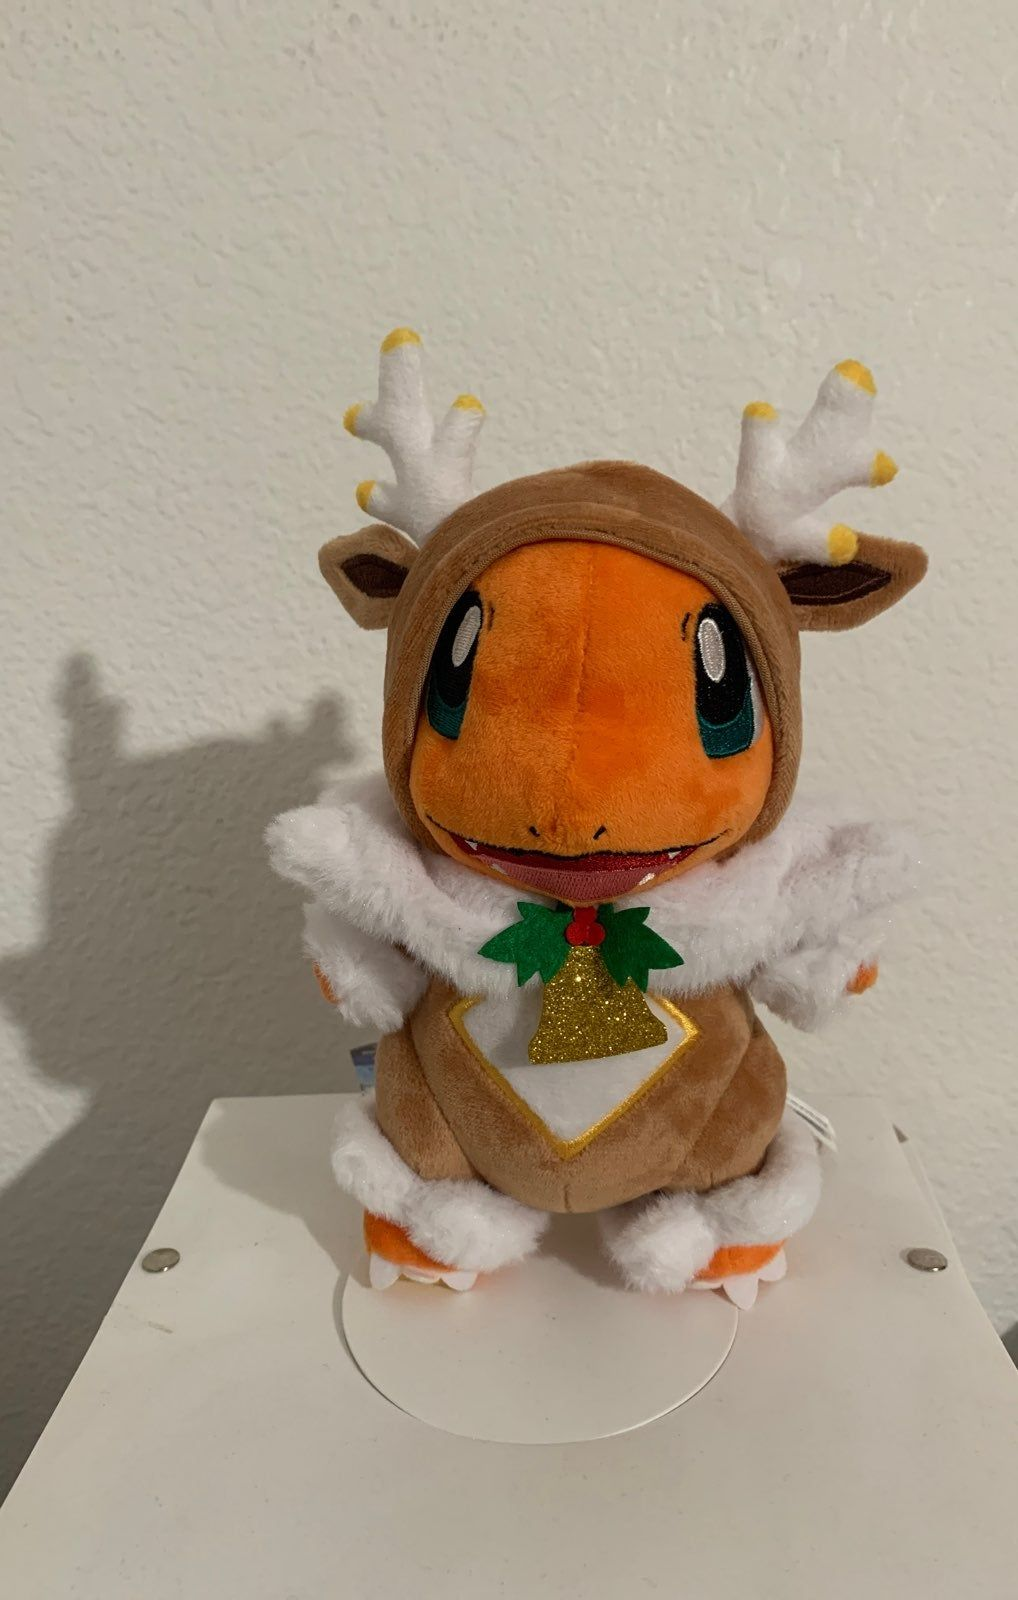 New Pokémon Holiday Light Christmas Plush Charmander with